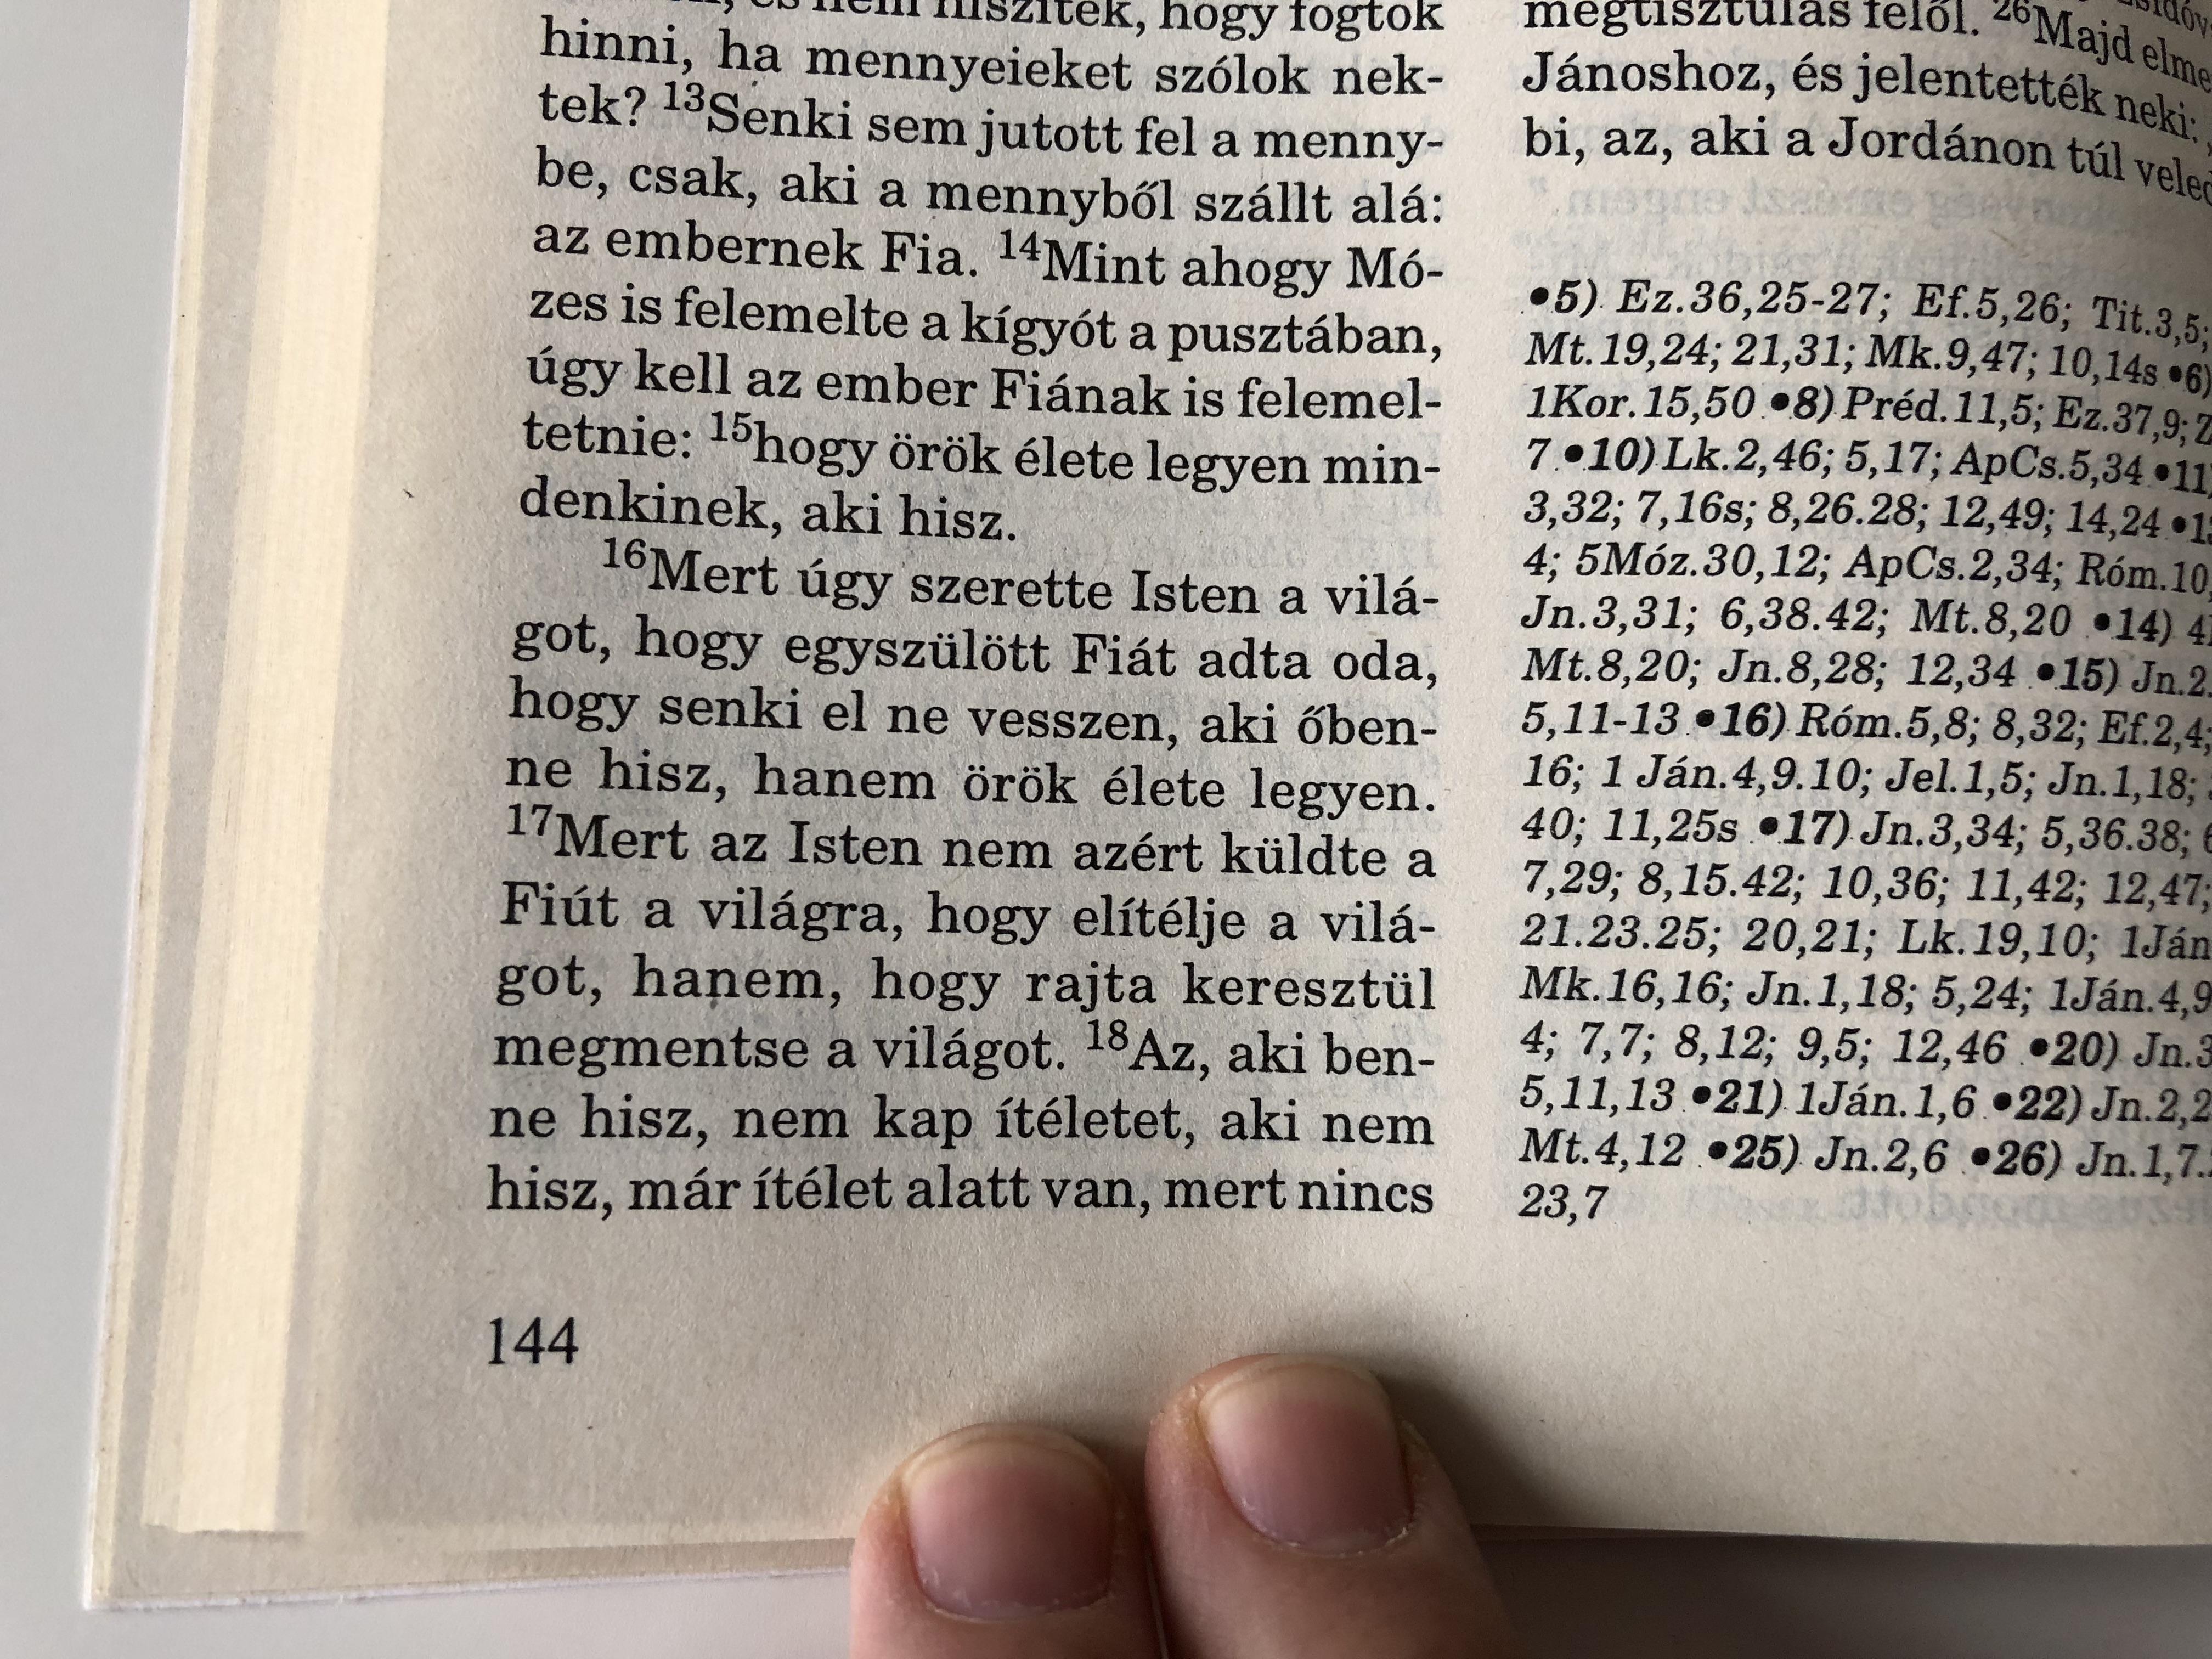 hungarian-new-testament-csia-jsz-vets-g-csia-lajos-fordit-sa-szerint-paperback-1997-3rd-edition-11-.jpg